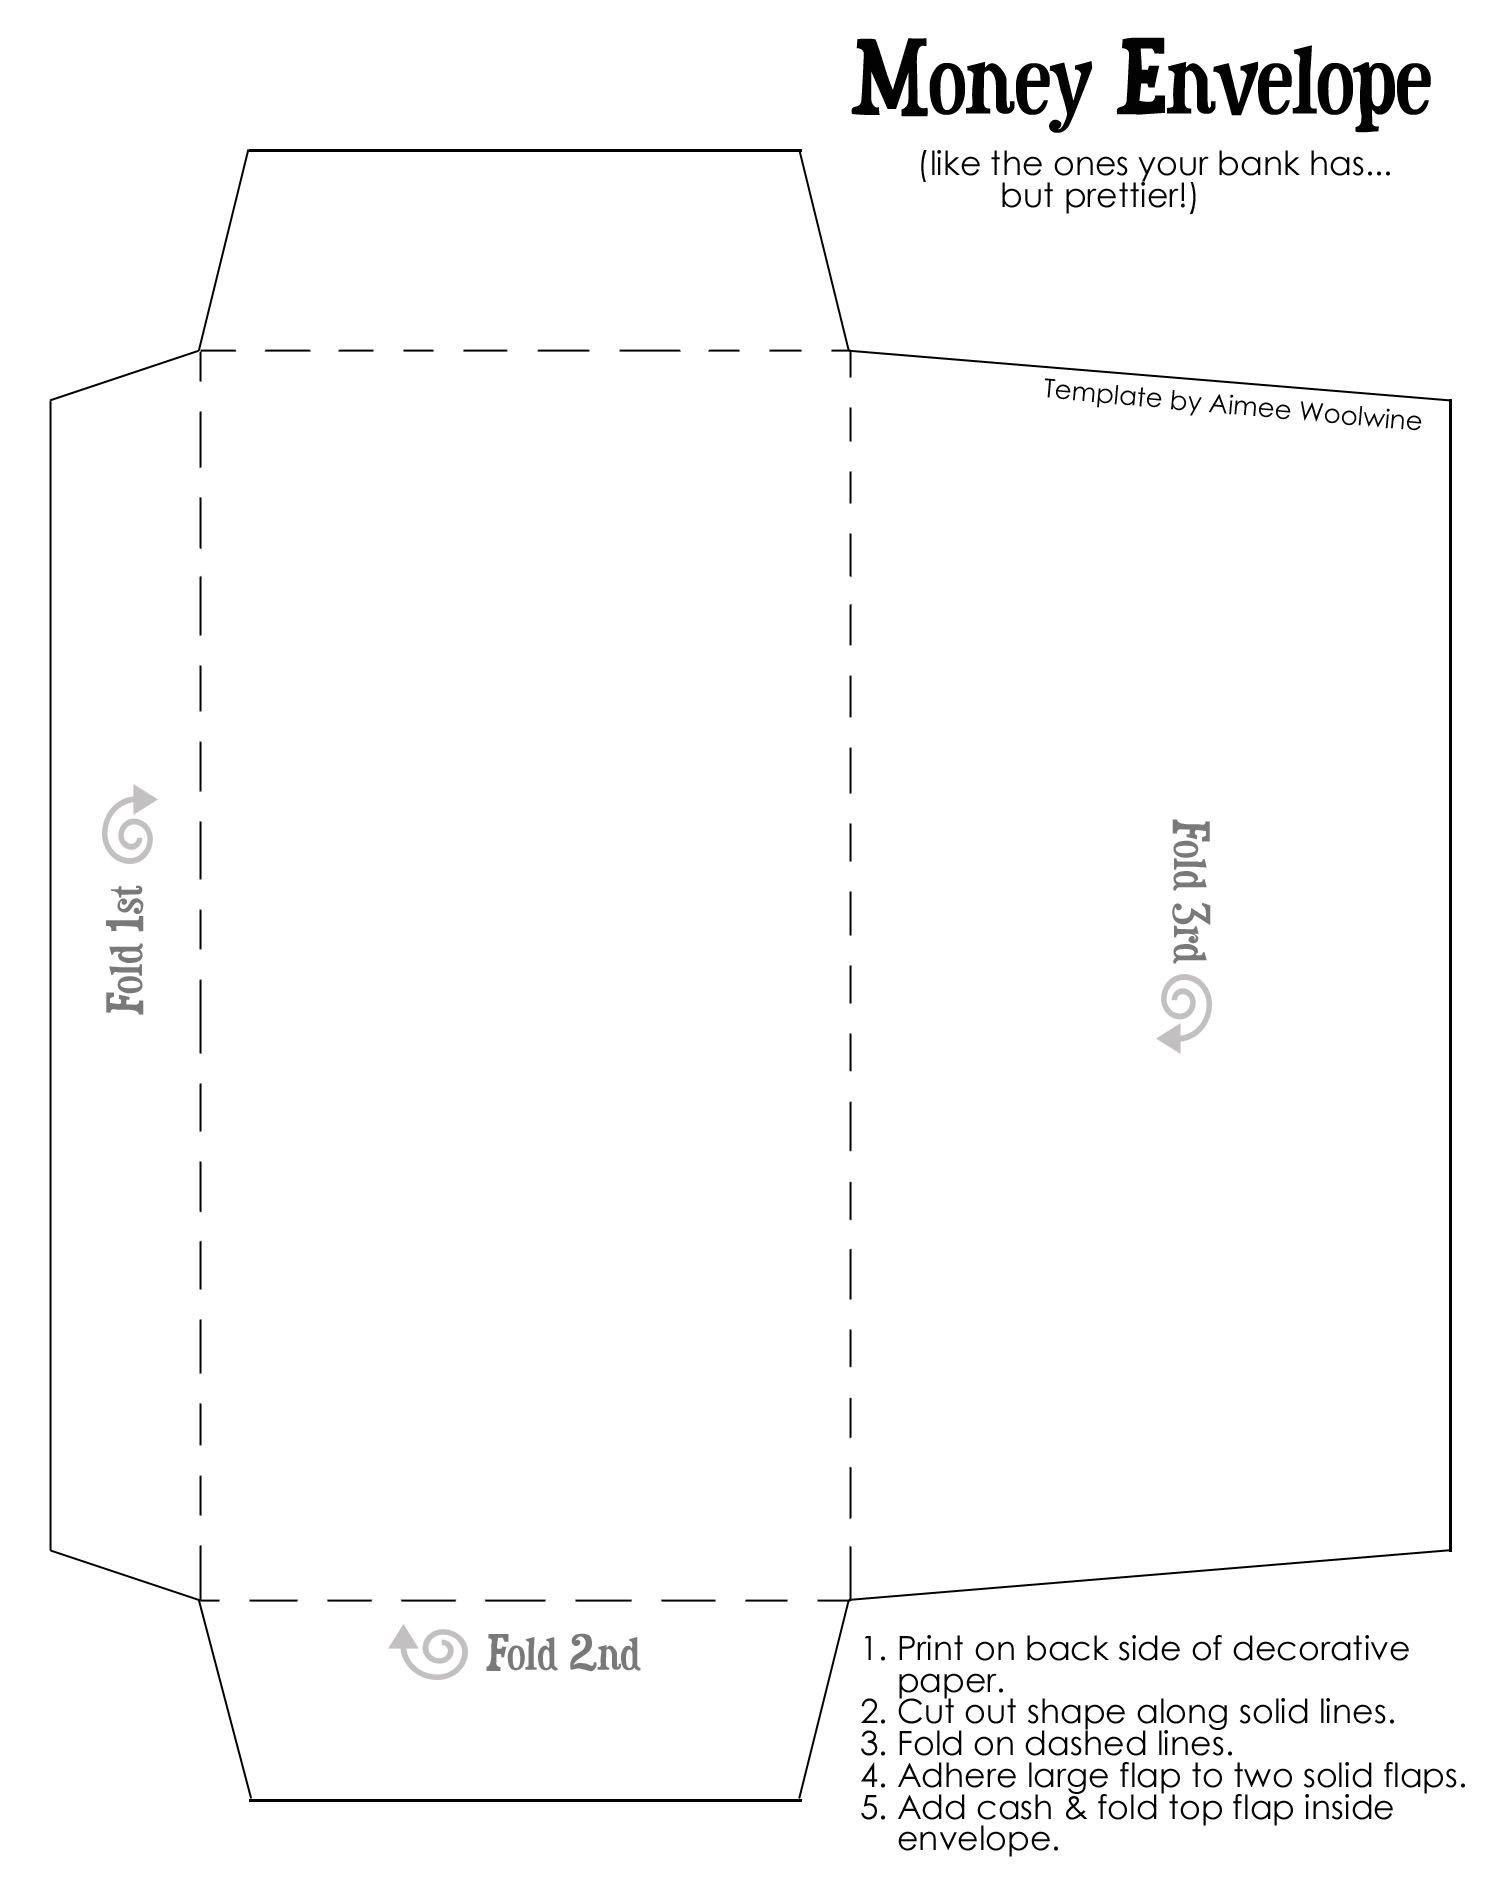 Printable Cash Envelope Template Luxury 037 Jb Cashenvelope1 Cash Bud Envelope Template Plan In 2020 Money Envelopes Diy Envelope Template Envelope Template